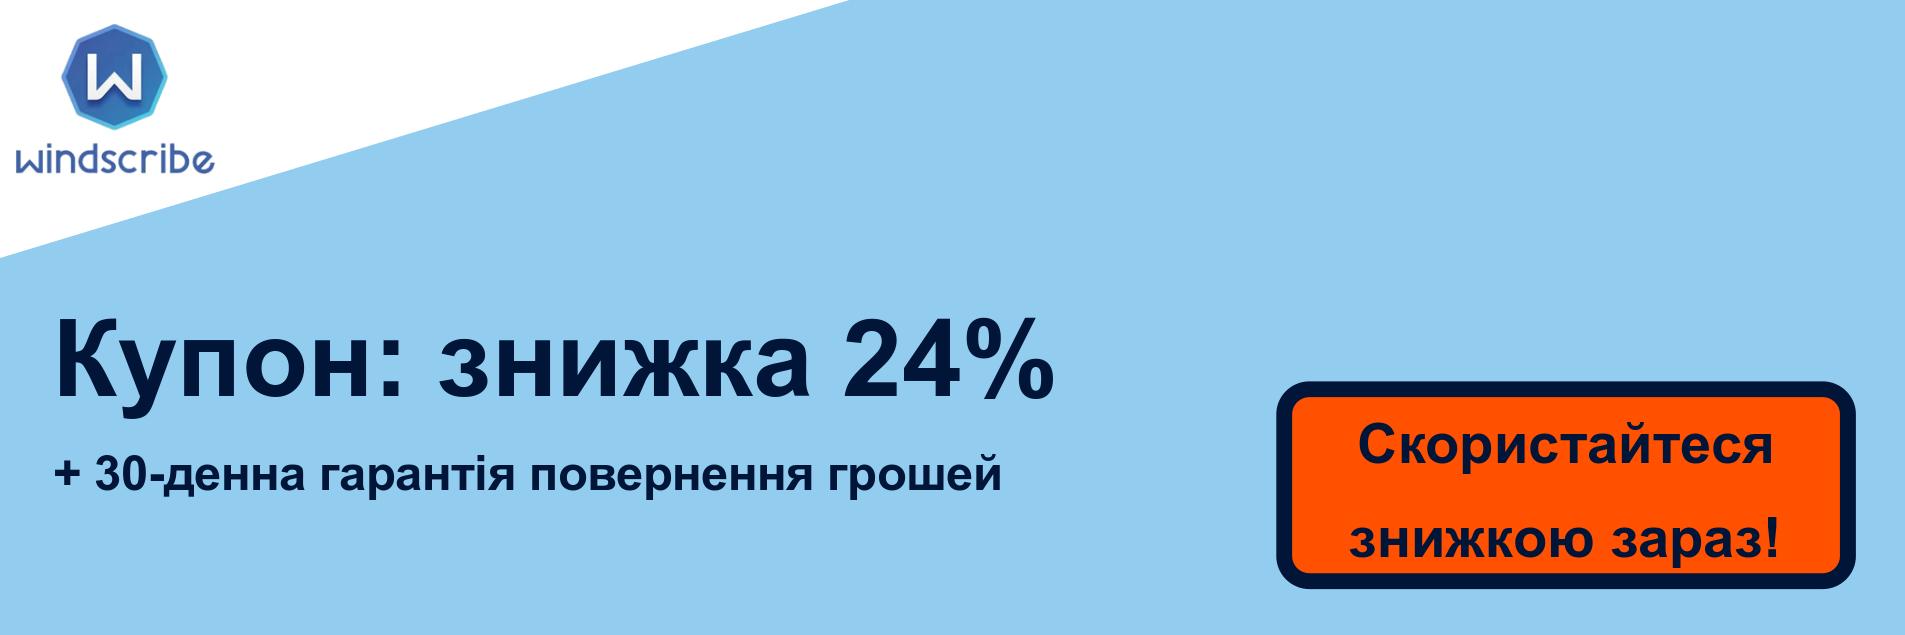 Банер купона WindScribe VPN - знижка 24%